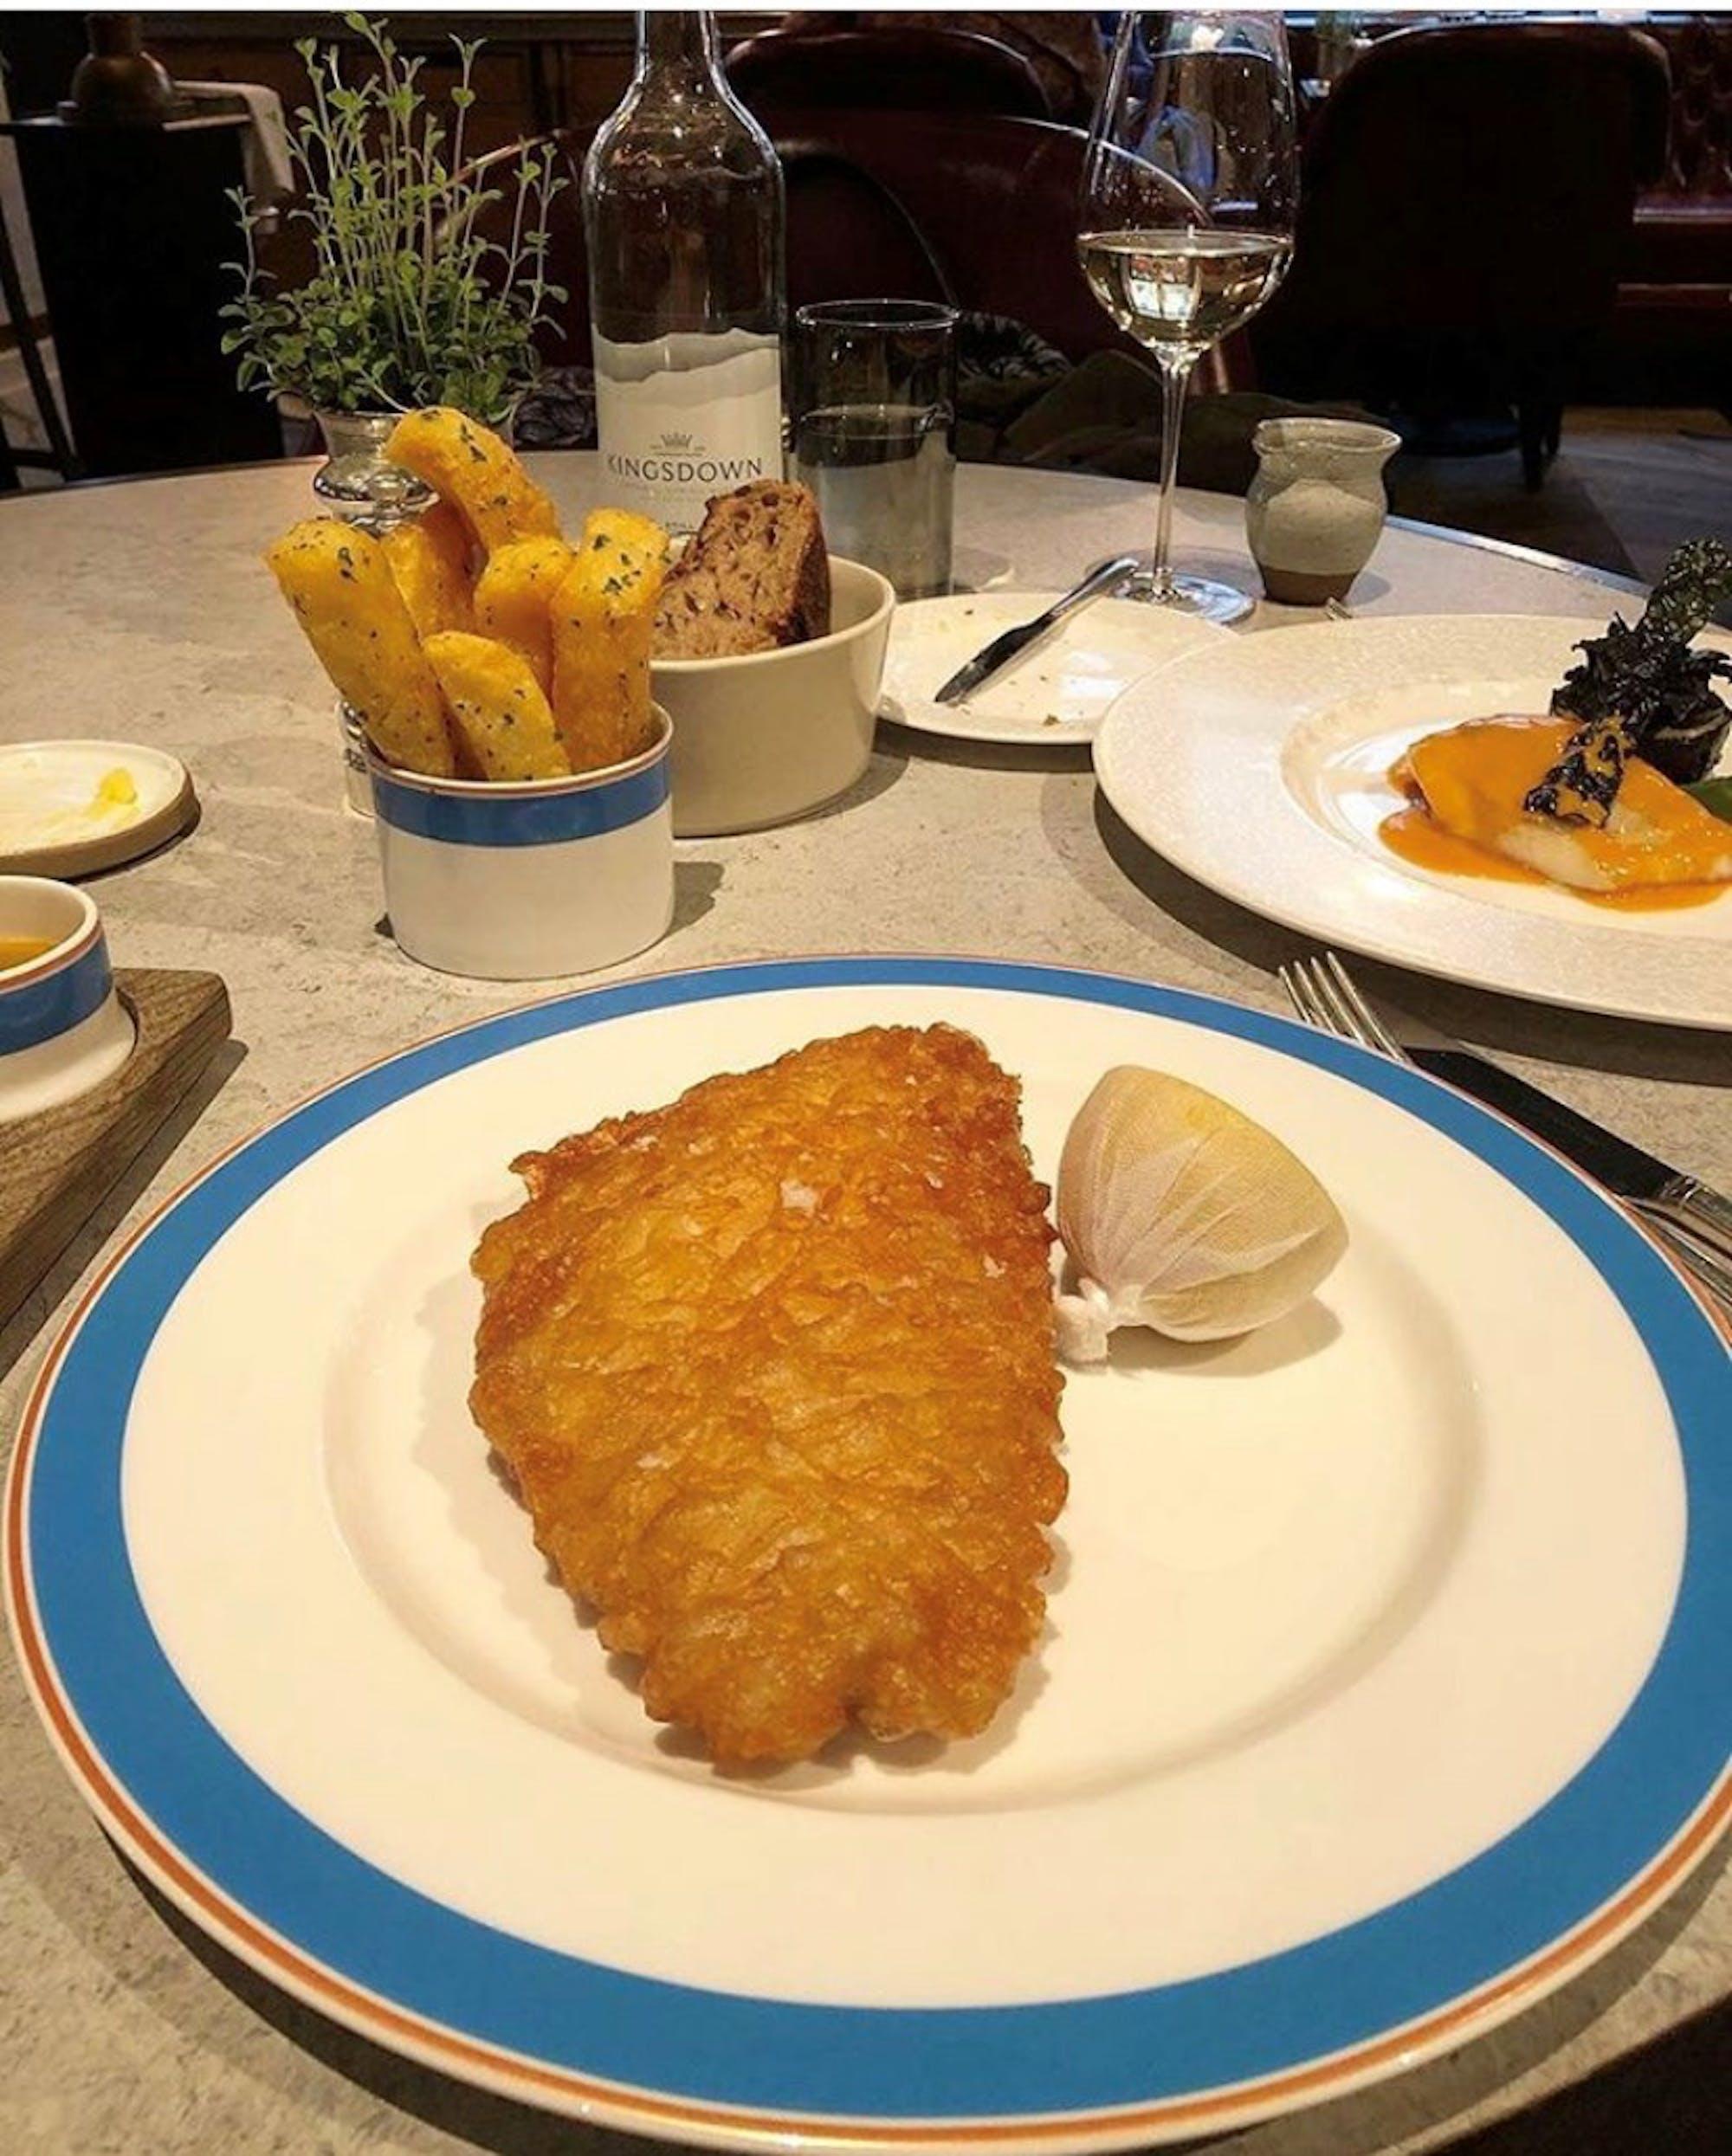 The Walpole Daily Practice  Fish & Chips - Kerridge's Bar & Grill at The Corinthia